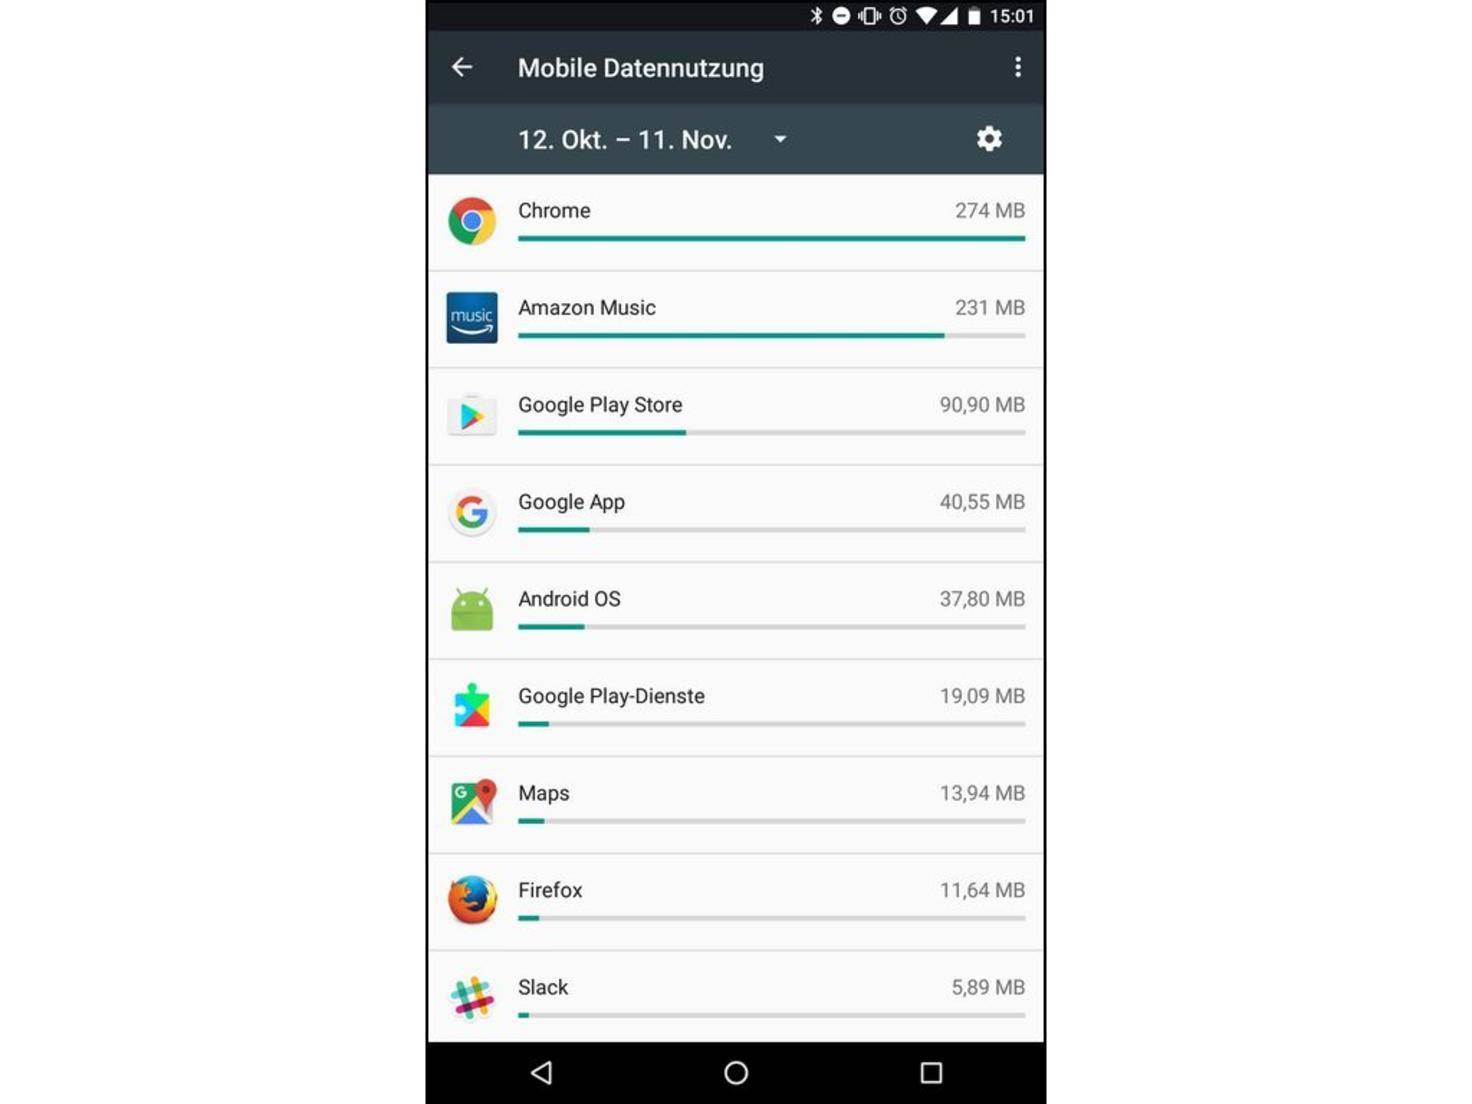 App Datenverbrauch